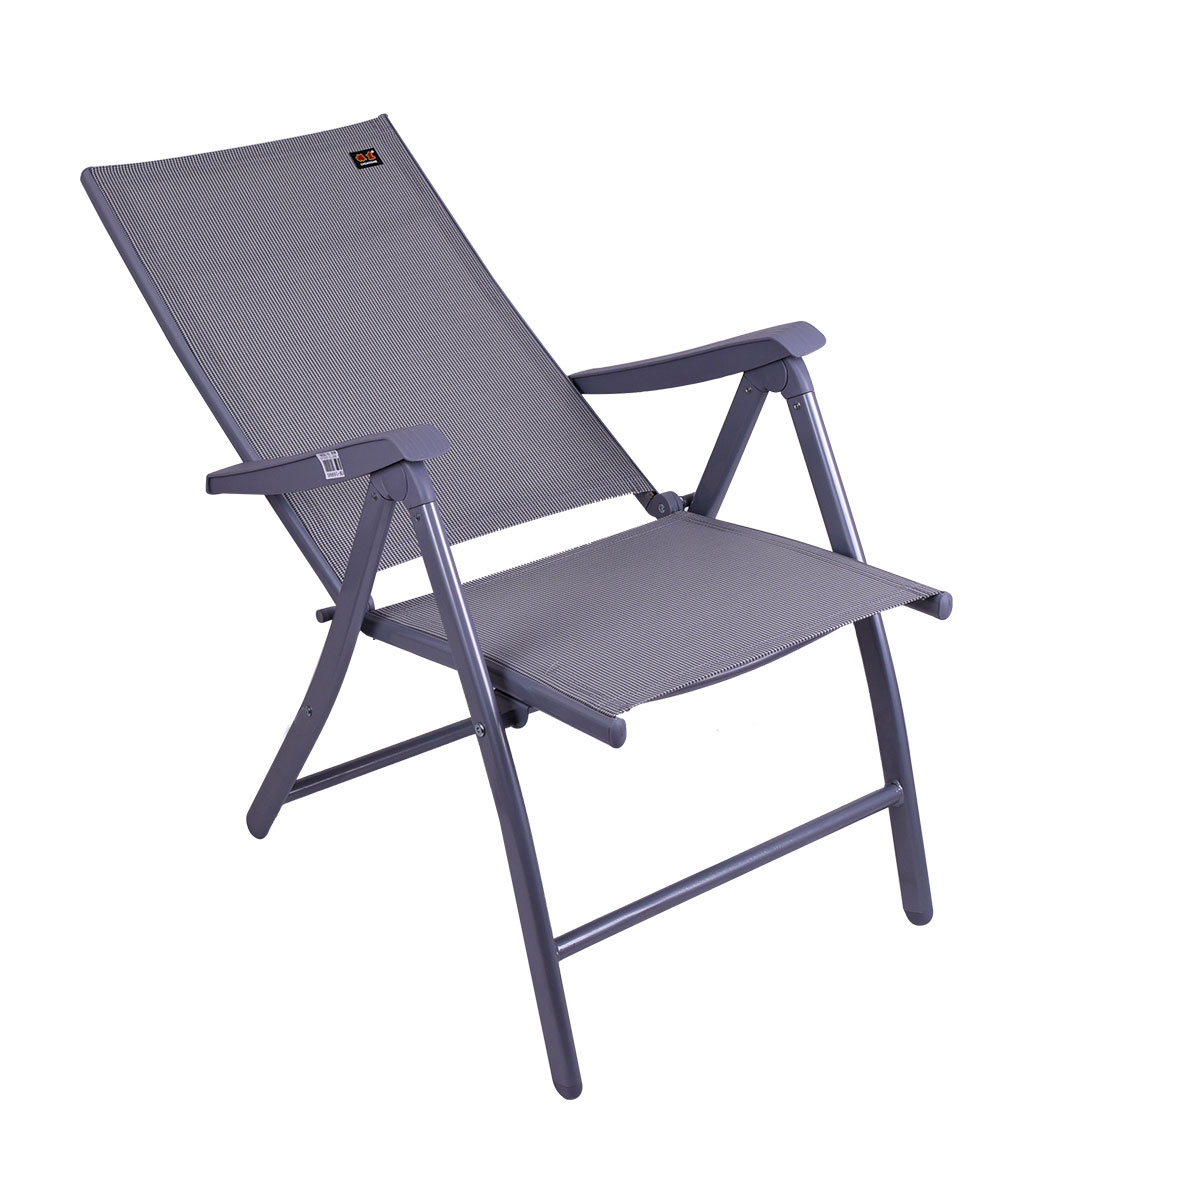 كرسي رحلات بذراعين وارجل قابل للطي رقم 16995 - من ماي مارت